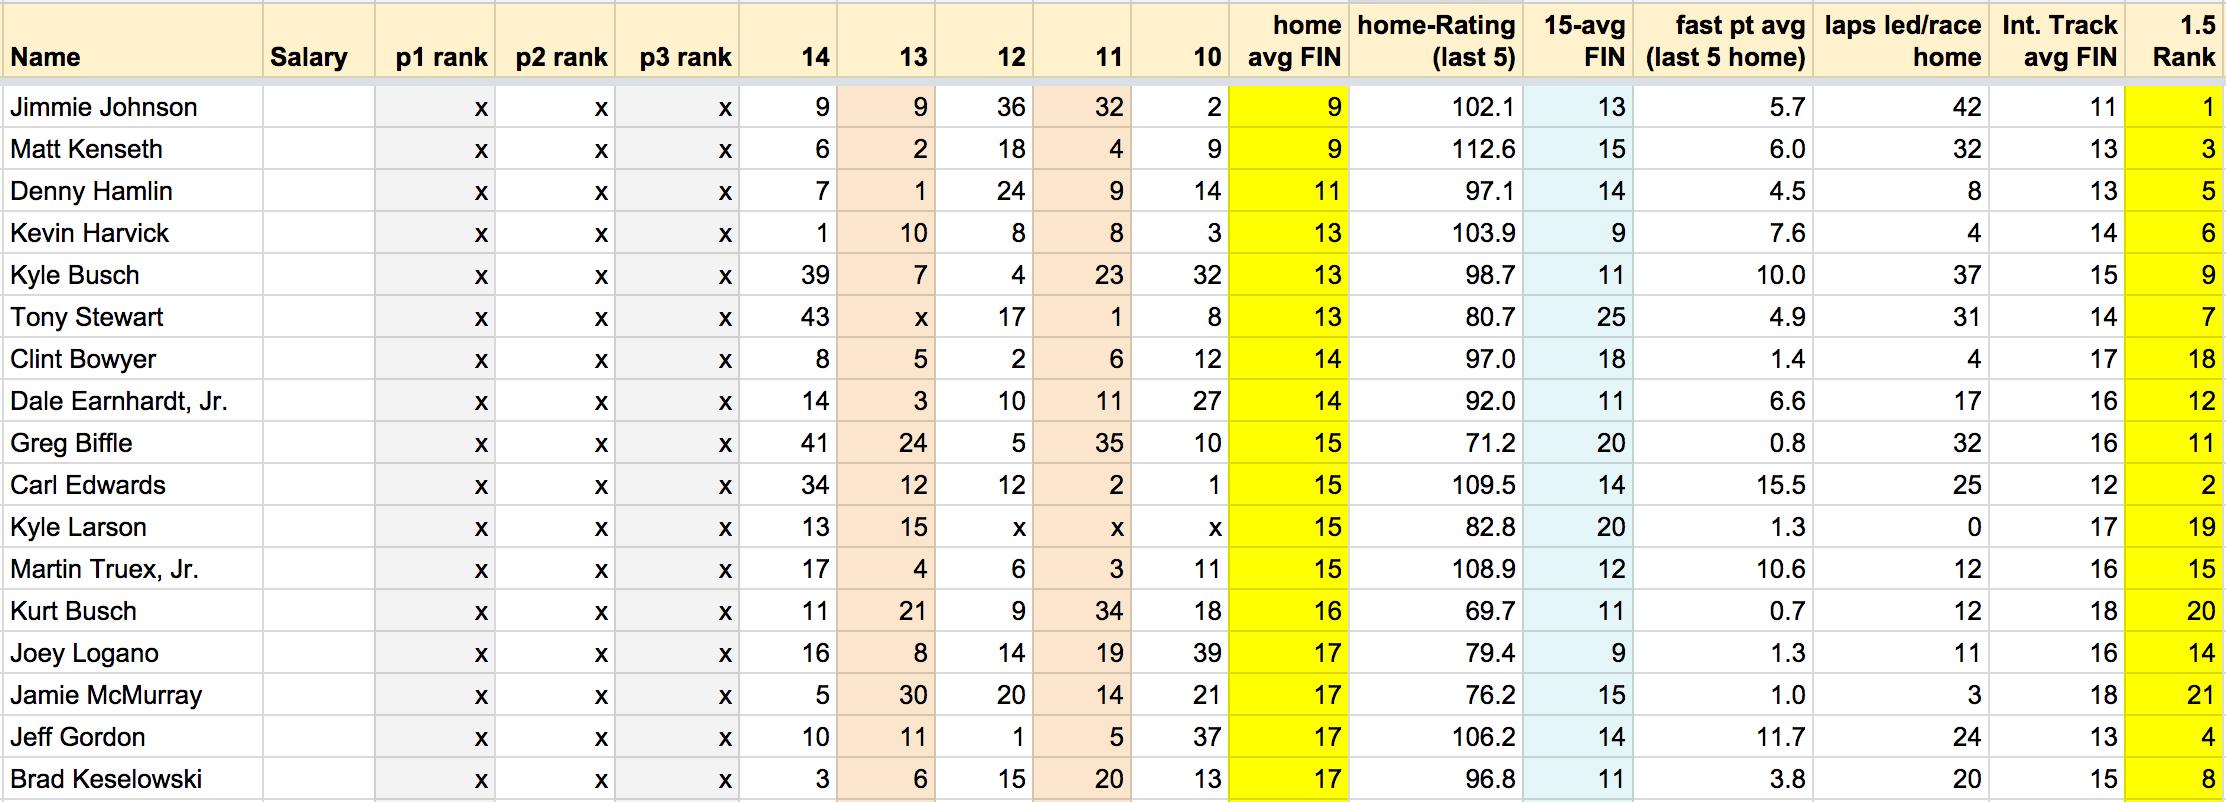 Draftkings Spreadsheet Regarding Nascar® Spreadsheet: Ford Ecoboost 400  Draftkings Playbook